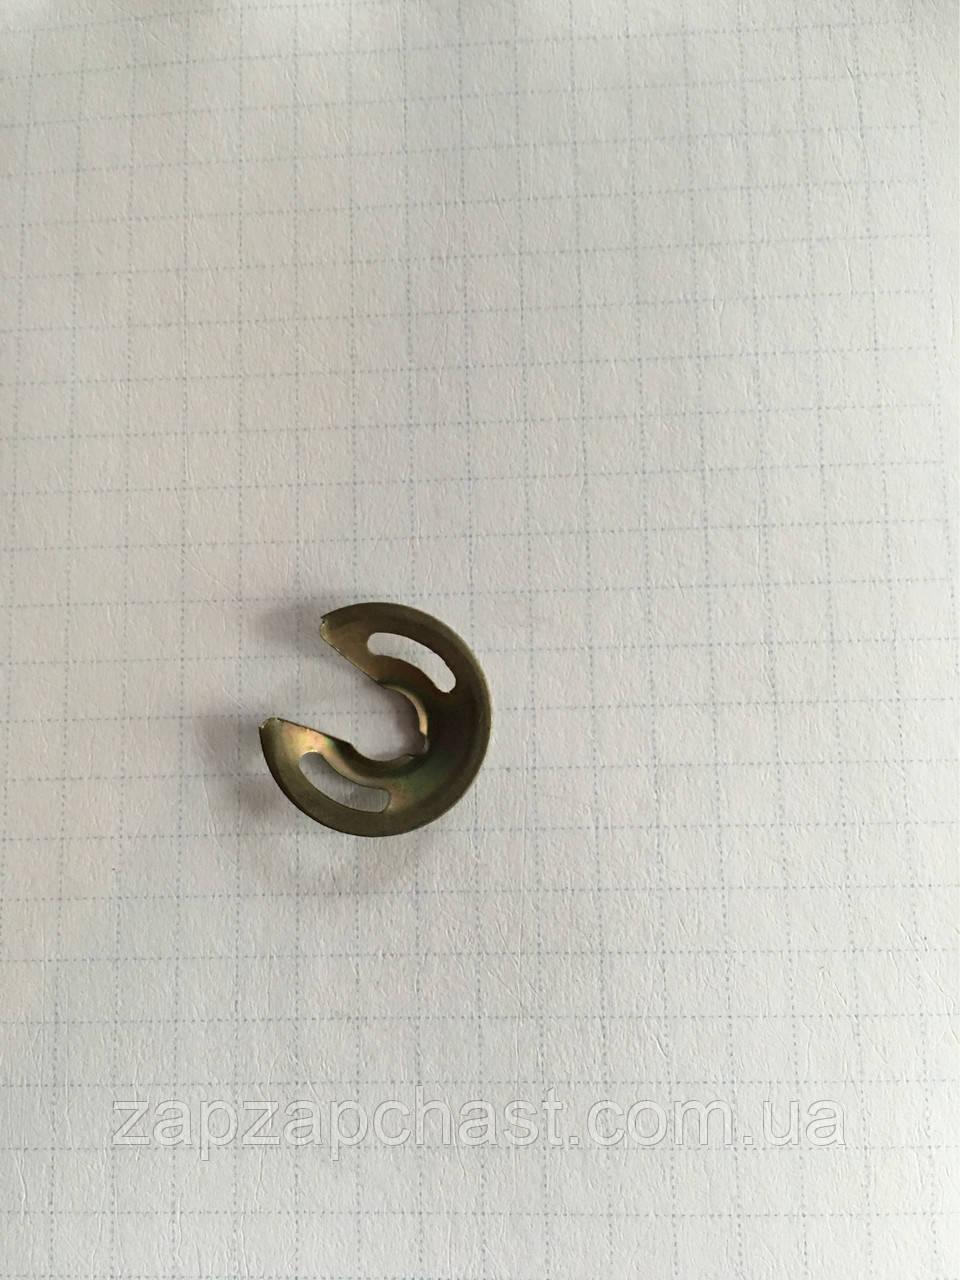 Стопорное кольцо крыльчатки электро вентилятора ваз 2103-2107, 2108-2115, заз 1102-1103 таврия, славута